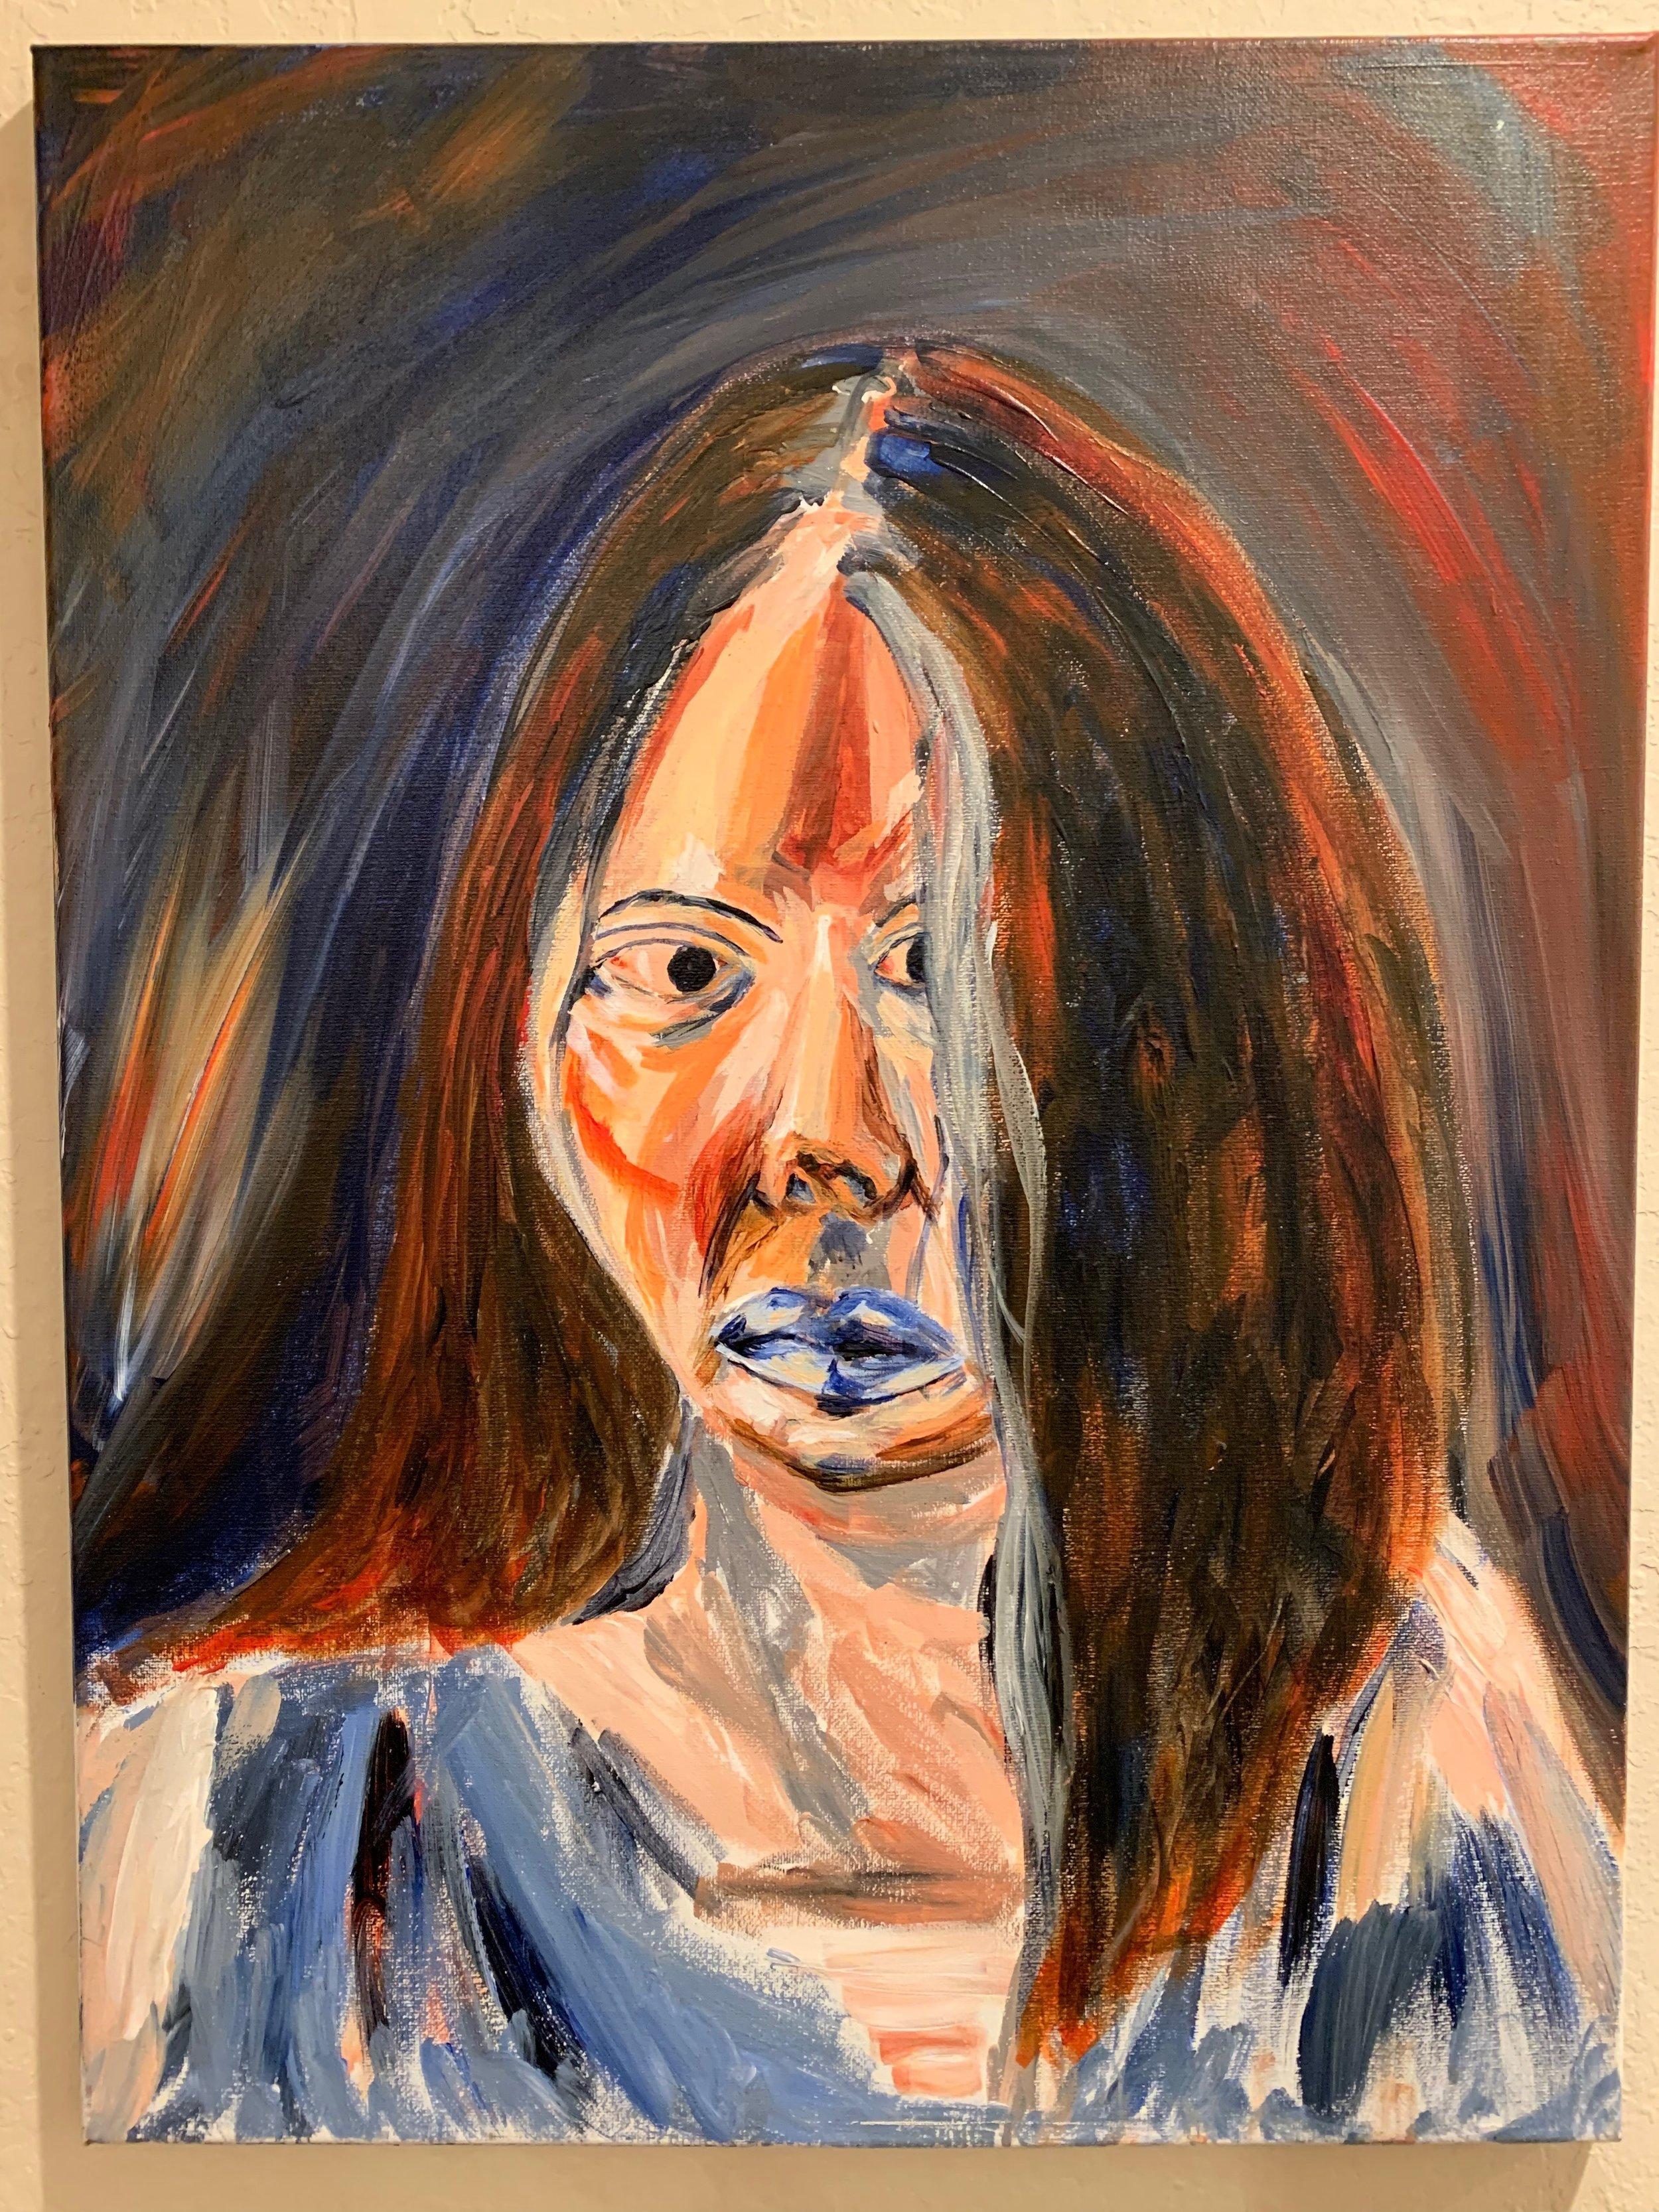 First Self-Portrait. Acrylic on Canvas. 18x24. 2017.